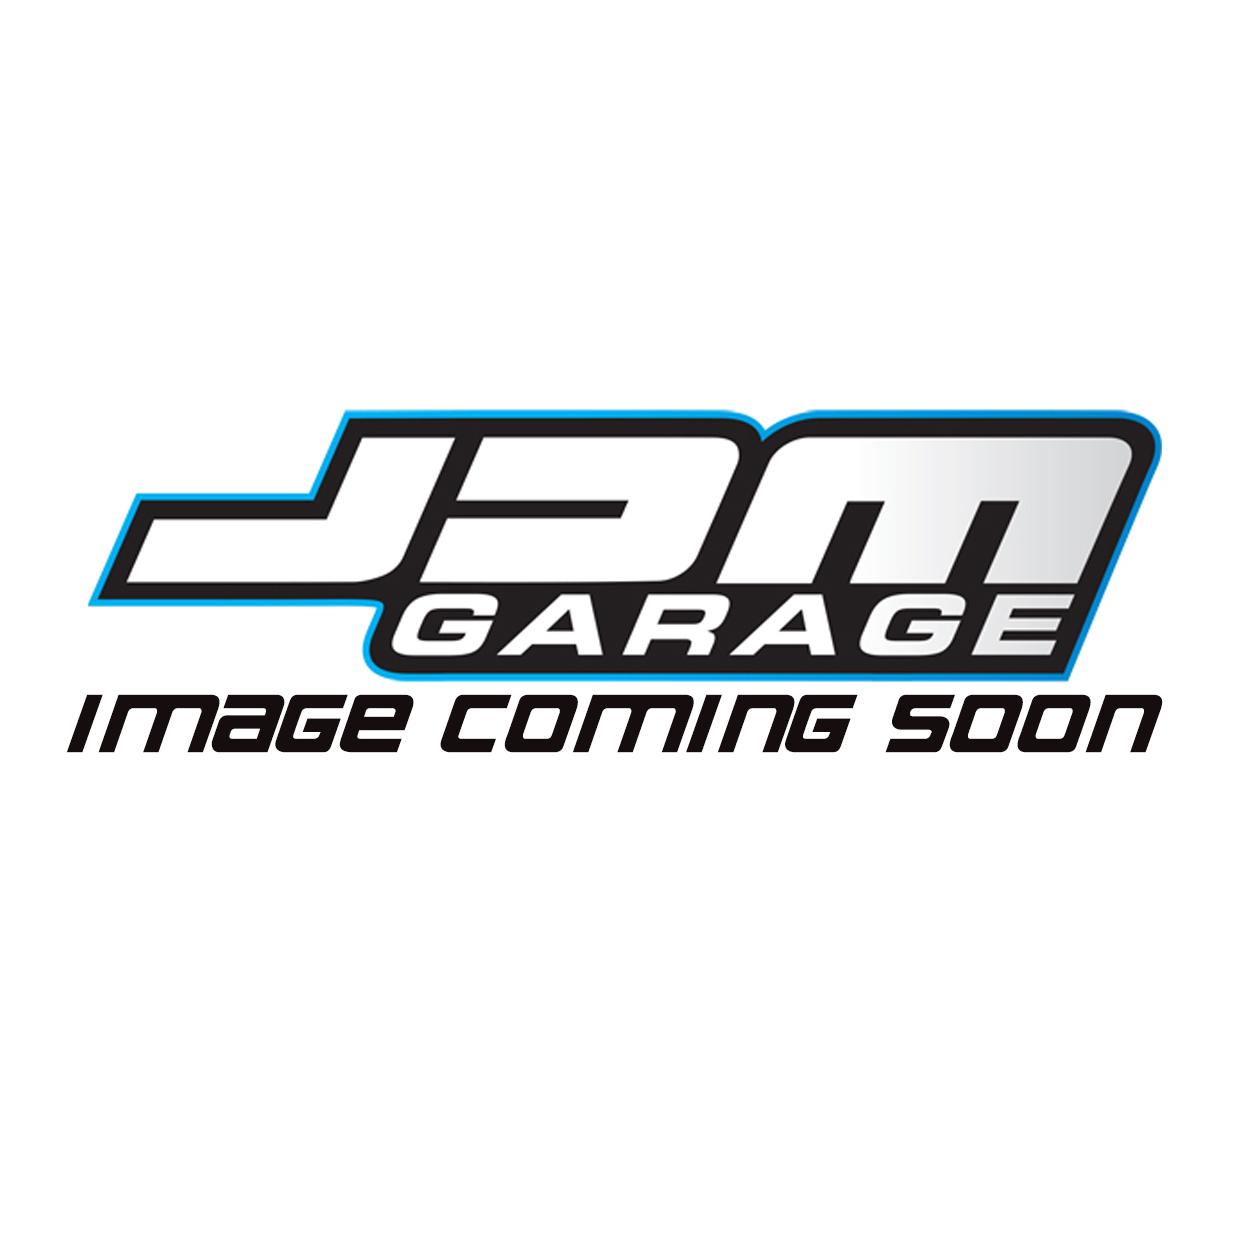 Nissan Blueprint Replacement Oil Filter Skyline / Silvia / Stagea / Cefiro / Laurel / Navara / Xtrail / Almera